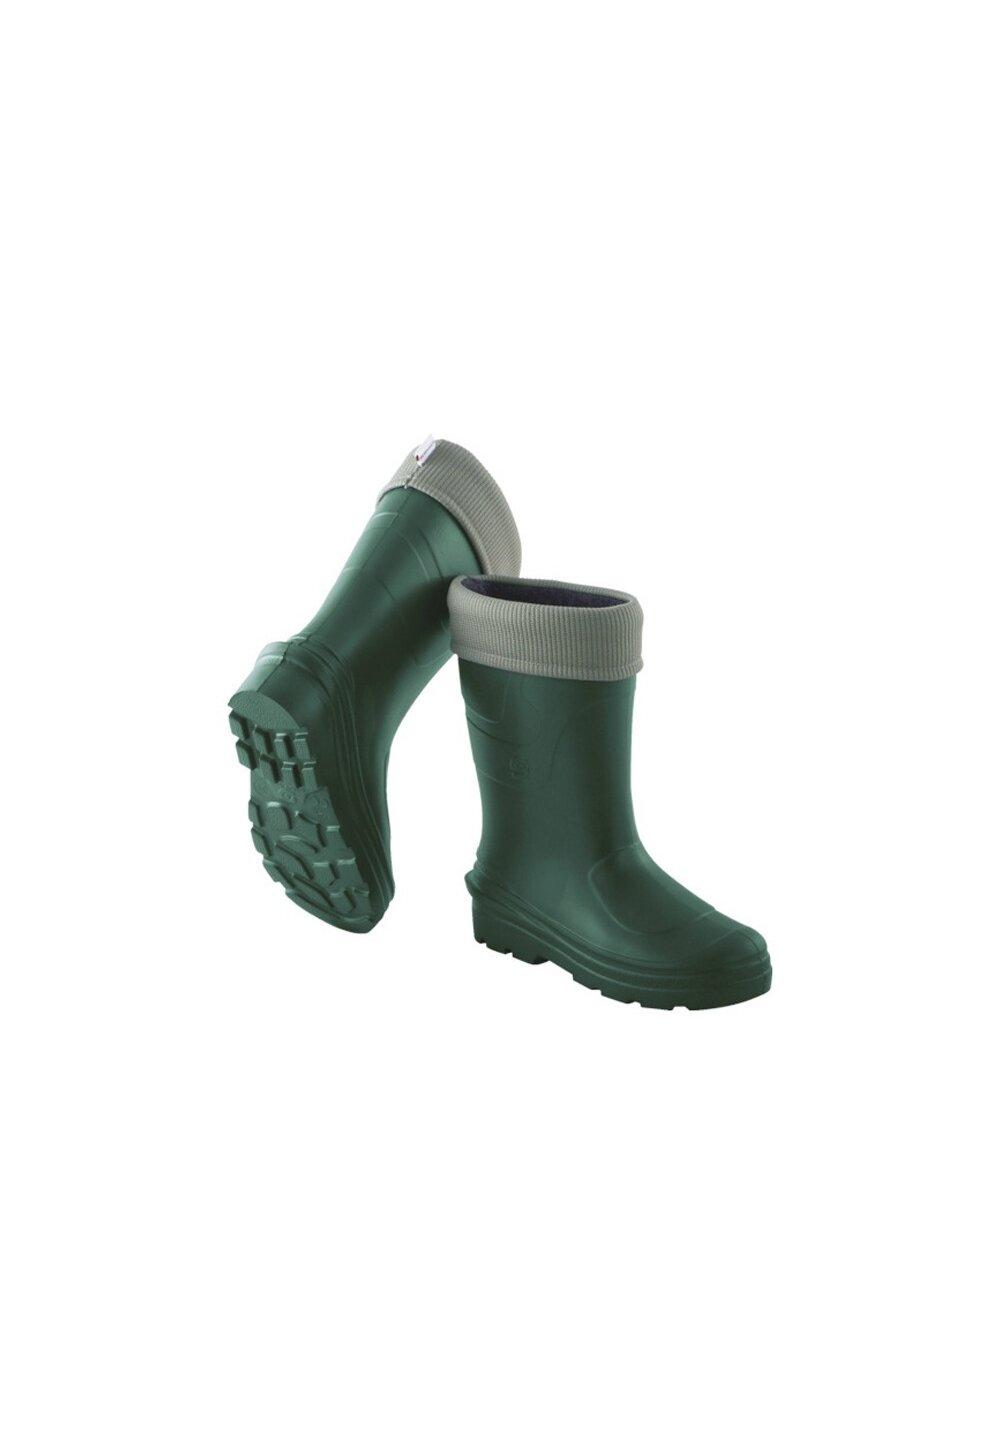 Cizme termoizolante din spuma cu ciorap, Montana, verzi